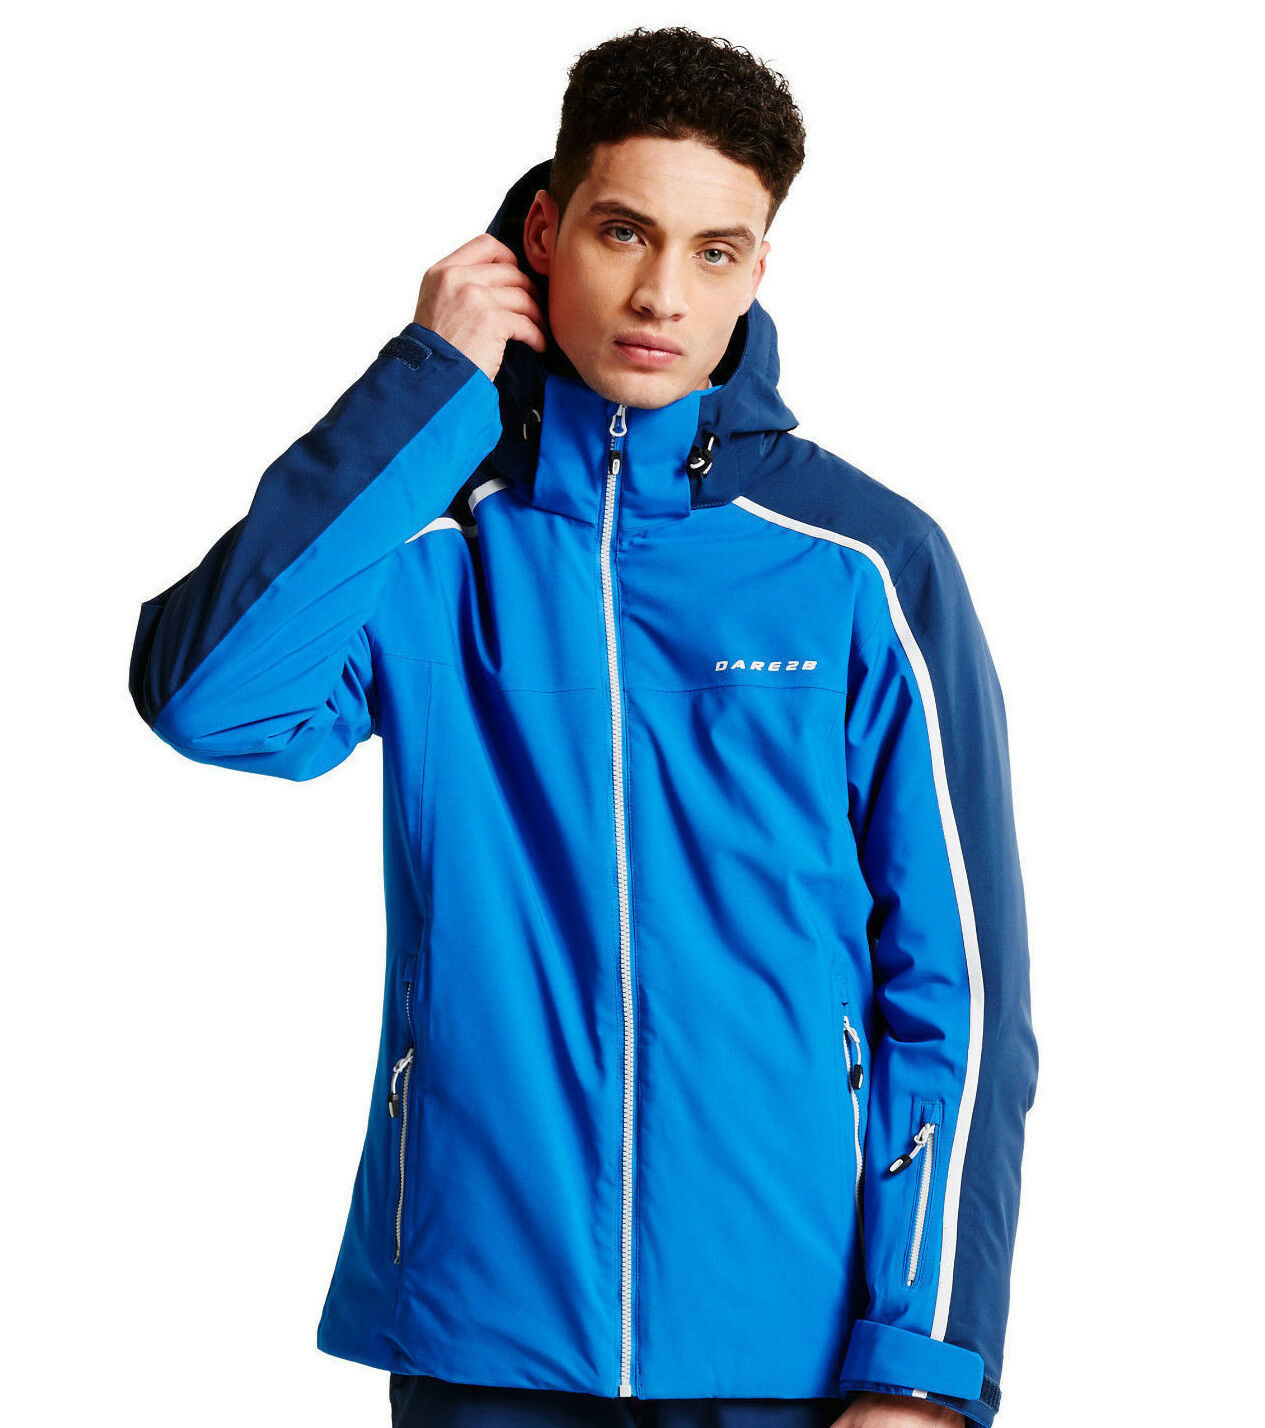 DARE2B Immensity II Herren Ski Snowboard Jacke Blau Größen M - 3XL